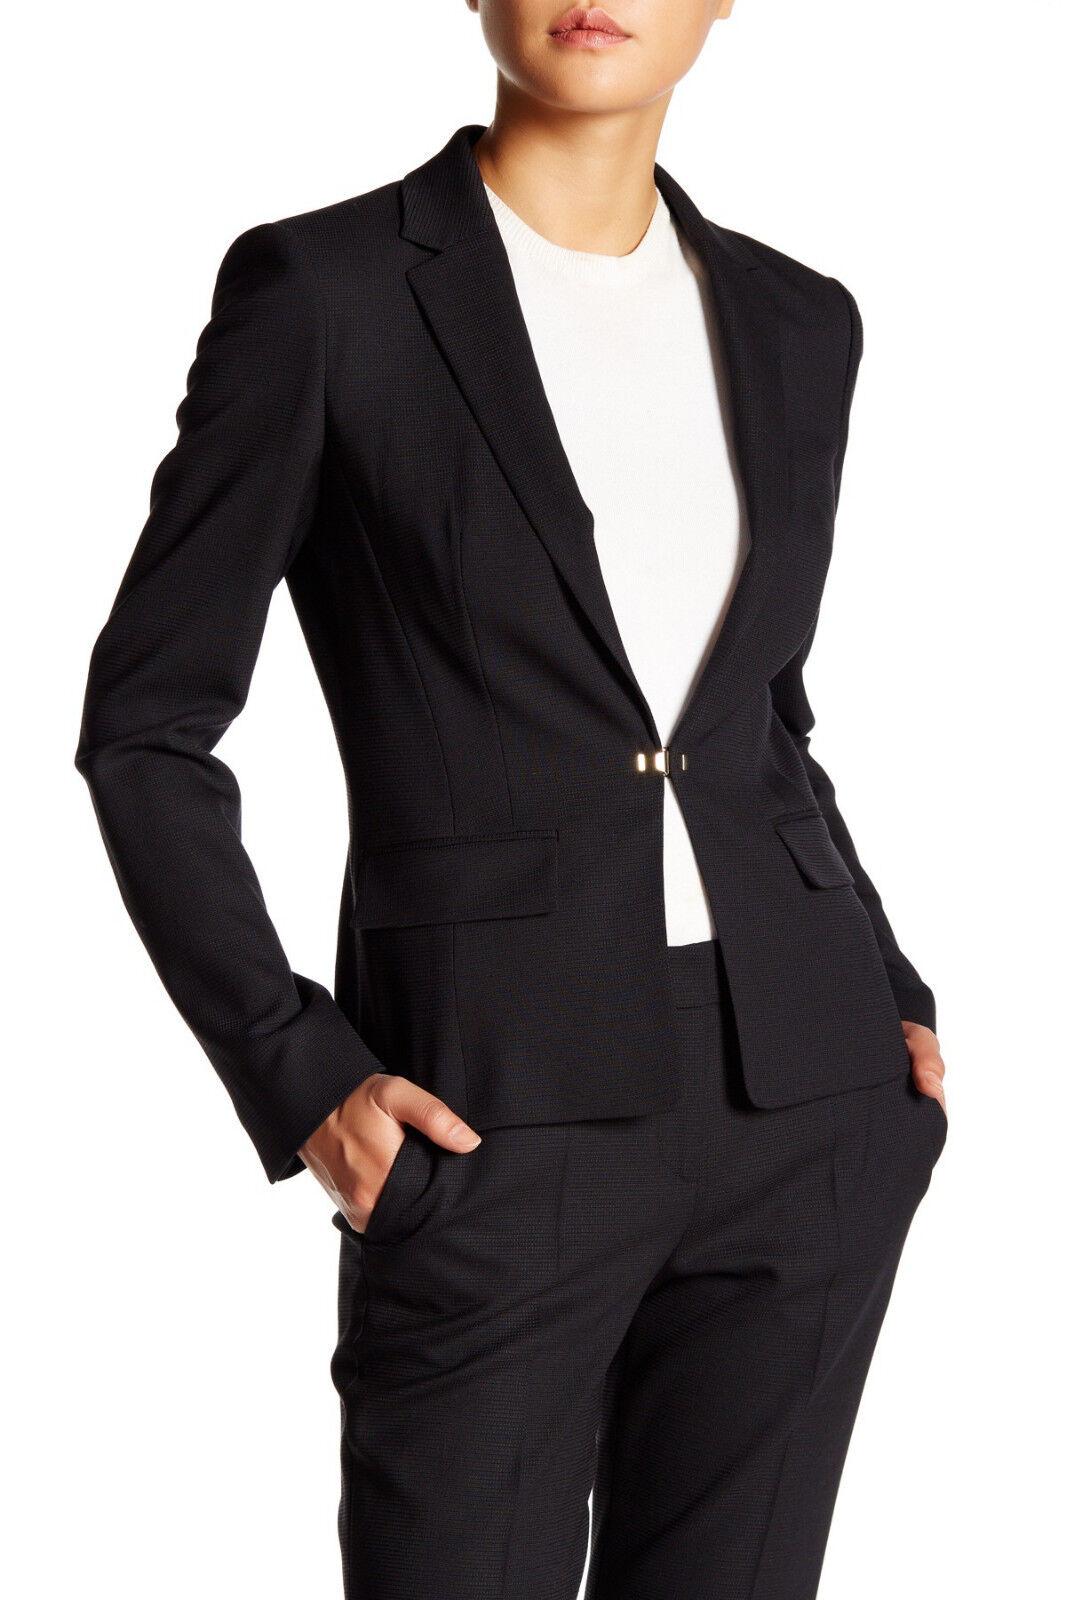 HUGO BOSS Jofena Virgin Wool Blend Blazer, Notch lapel, Size 16,  595, NWT